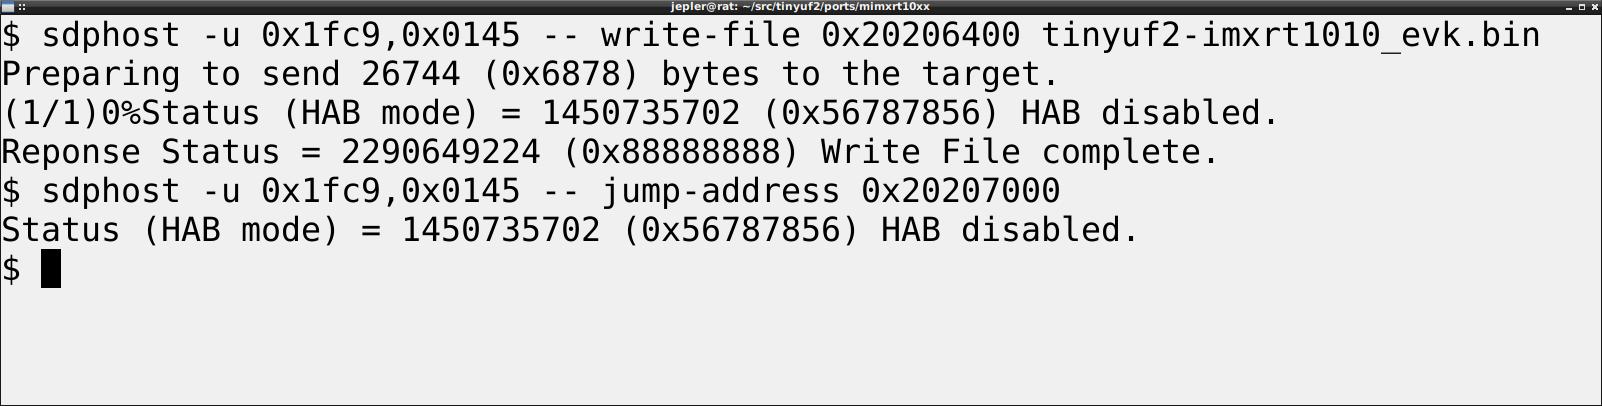 microcontrollers_Screenshot_2021-03-25_11-45-31.png